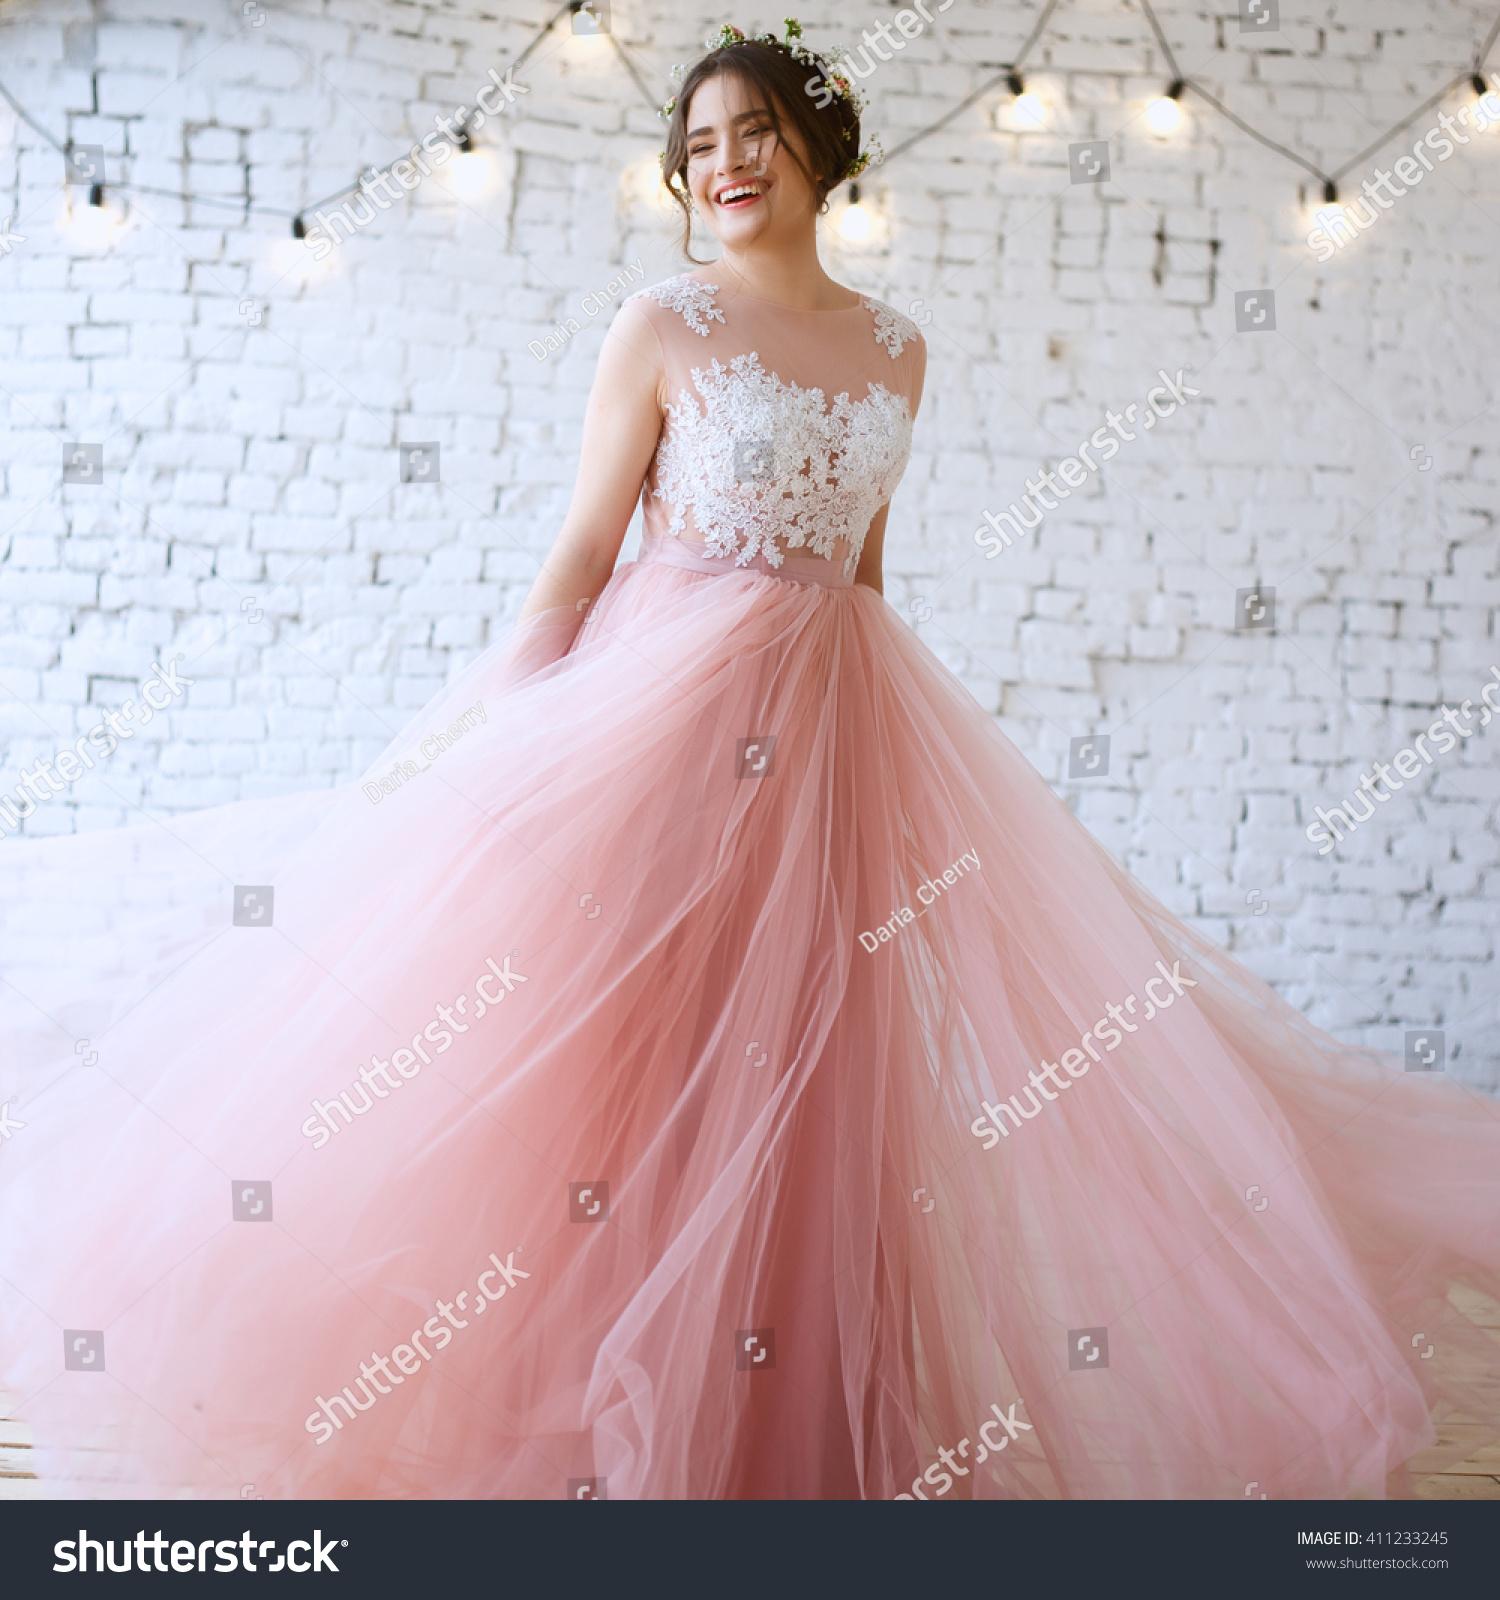 Bride Tender Light Pink Wedding Dress Stock Photo (Edit Now ...